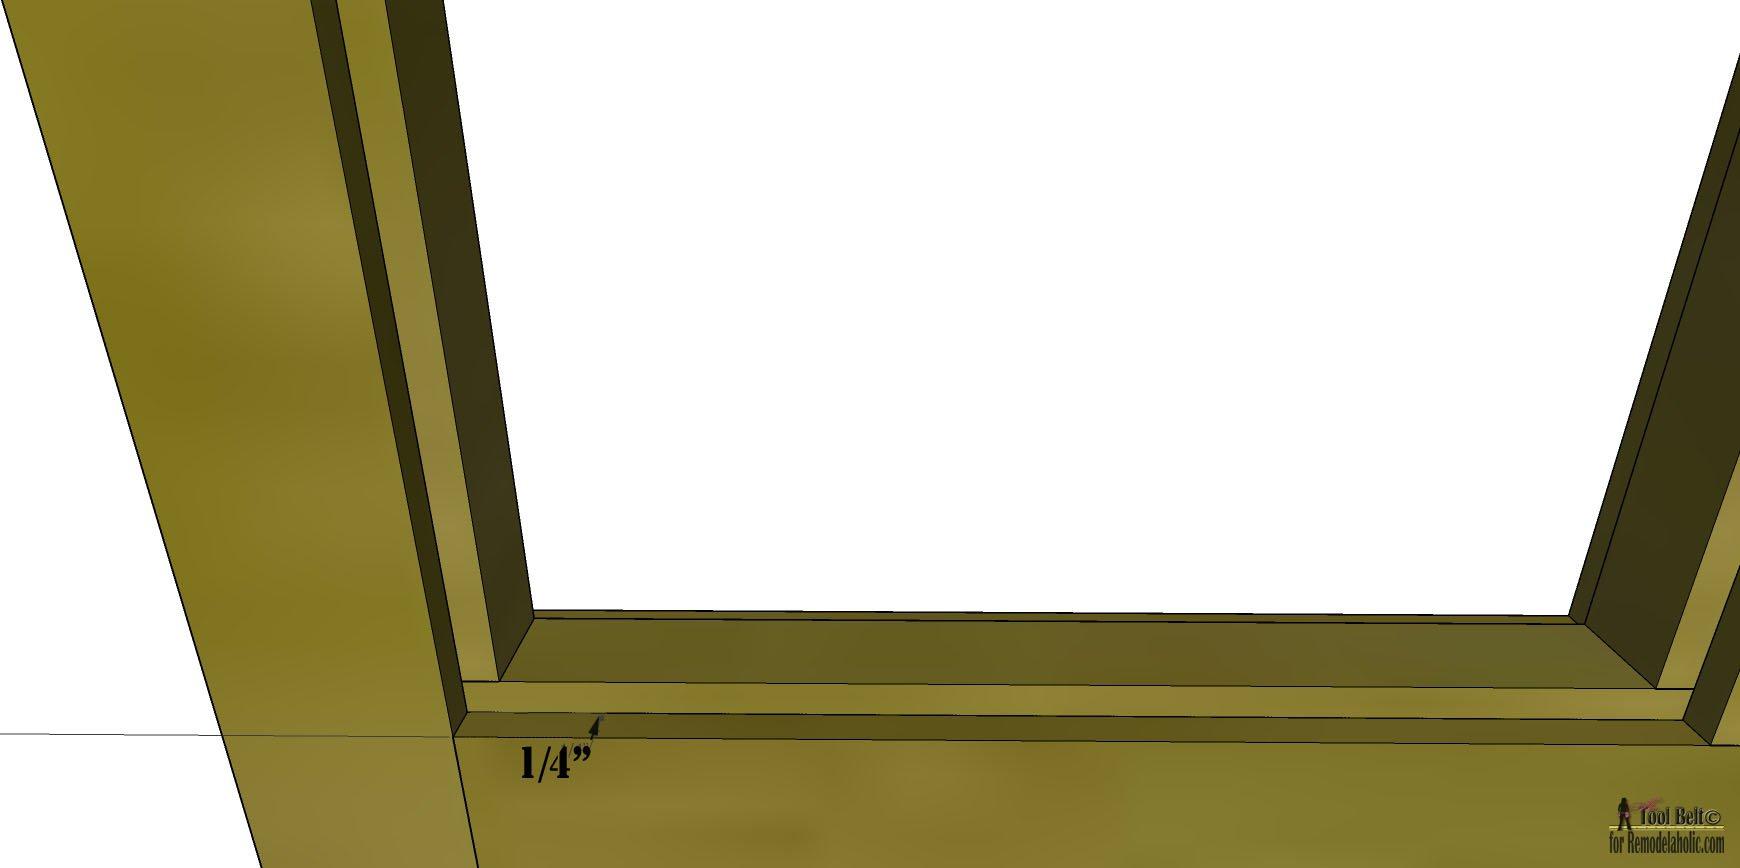 Remodelaholic | Build It: 6-Pane Decorative Window